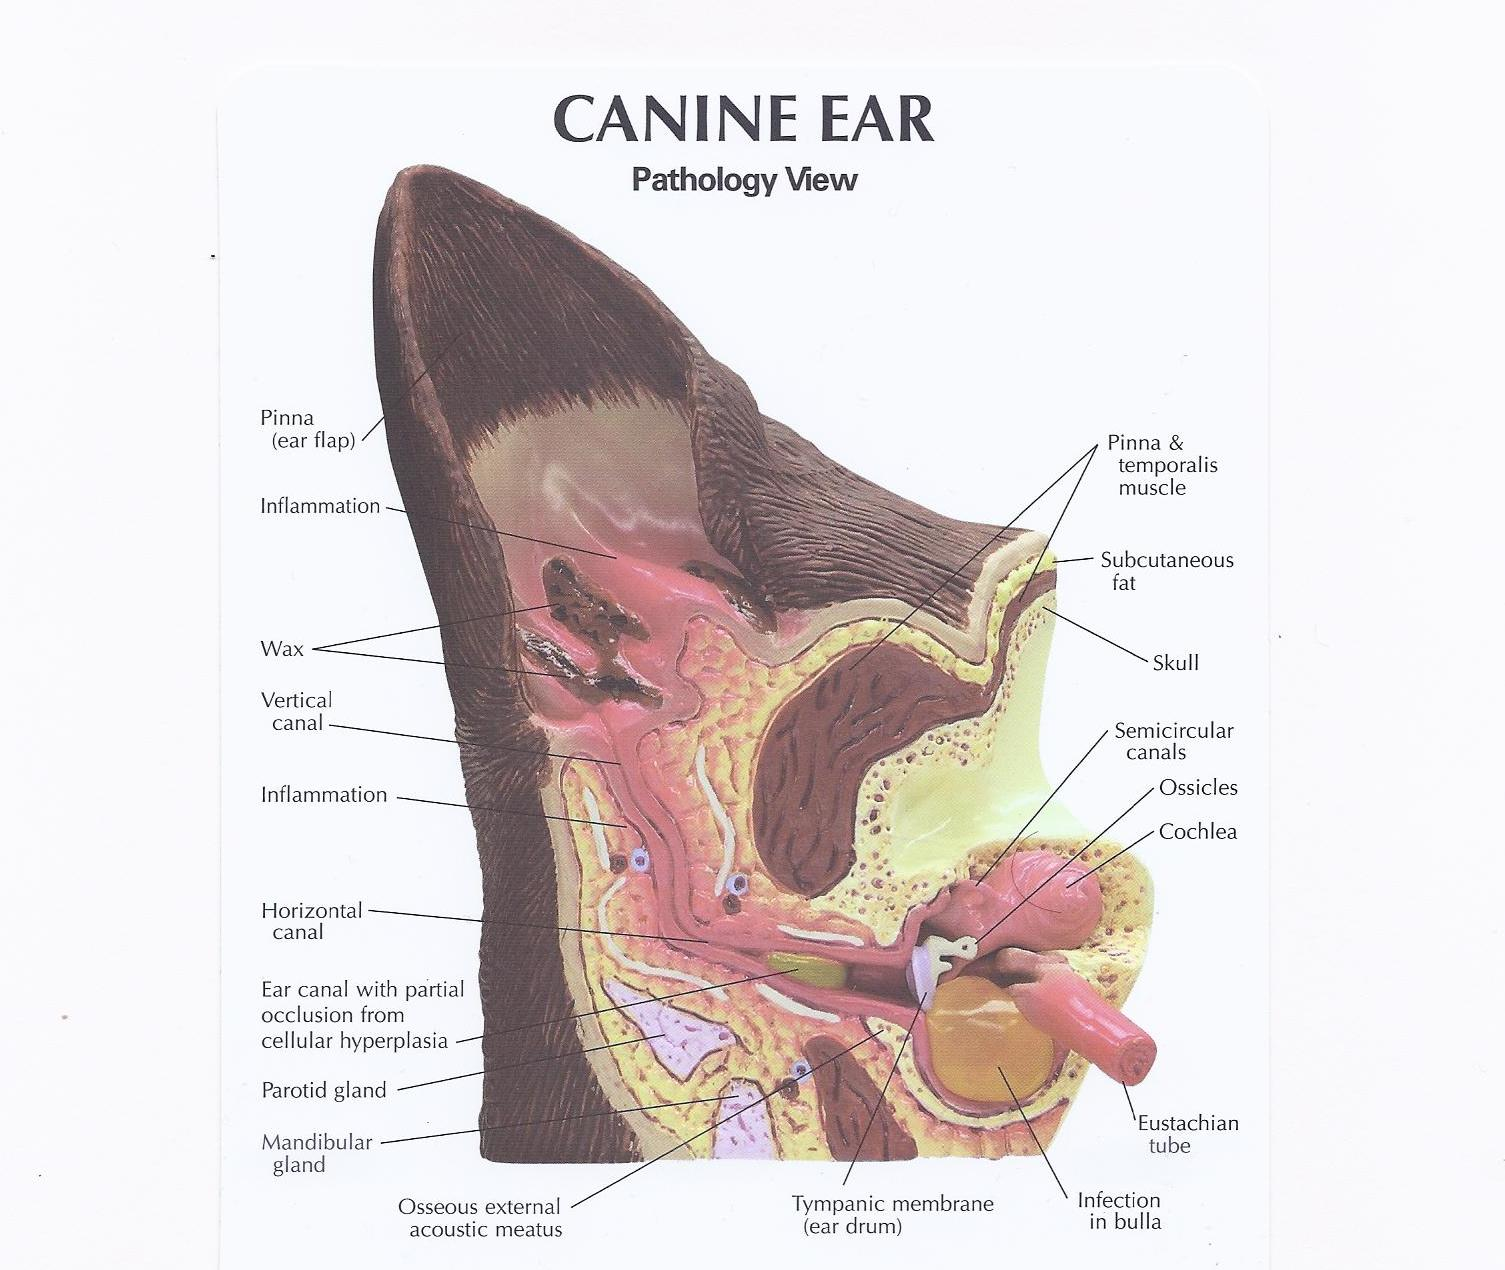 Canine Ear Normal Pathology